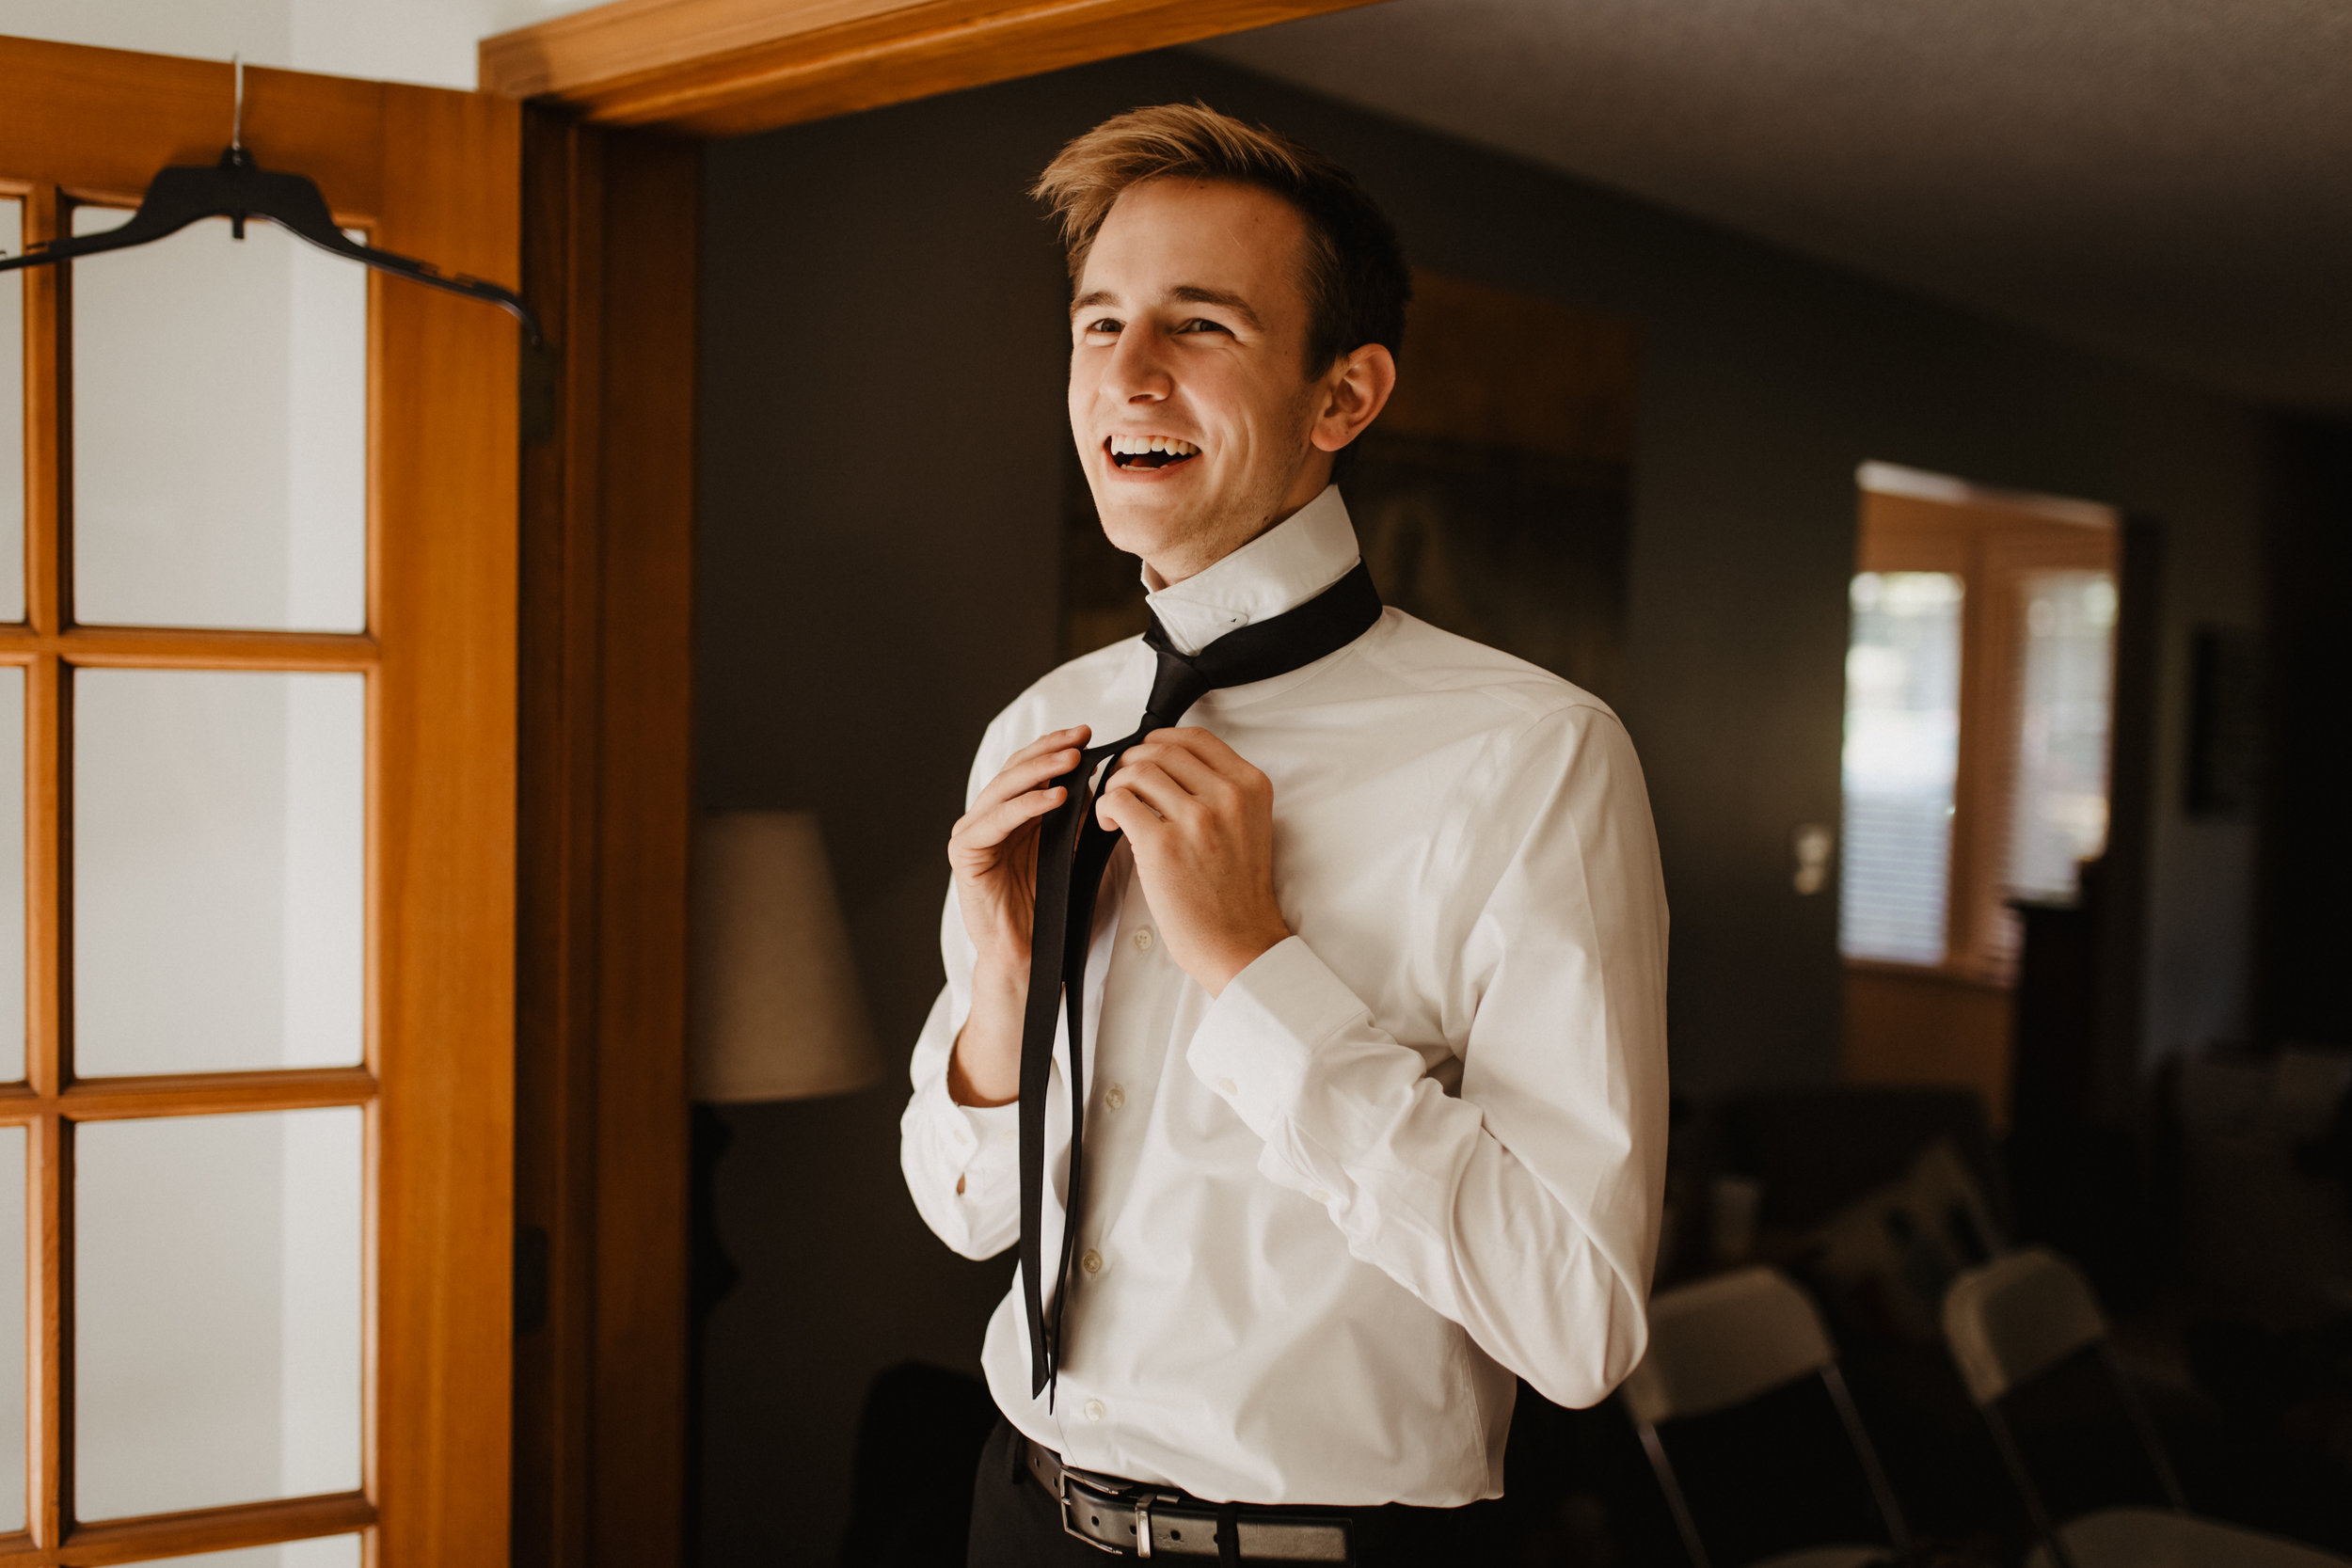 Groomsmen-Wedding-Preparation-Photo-01